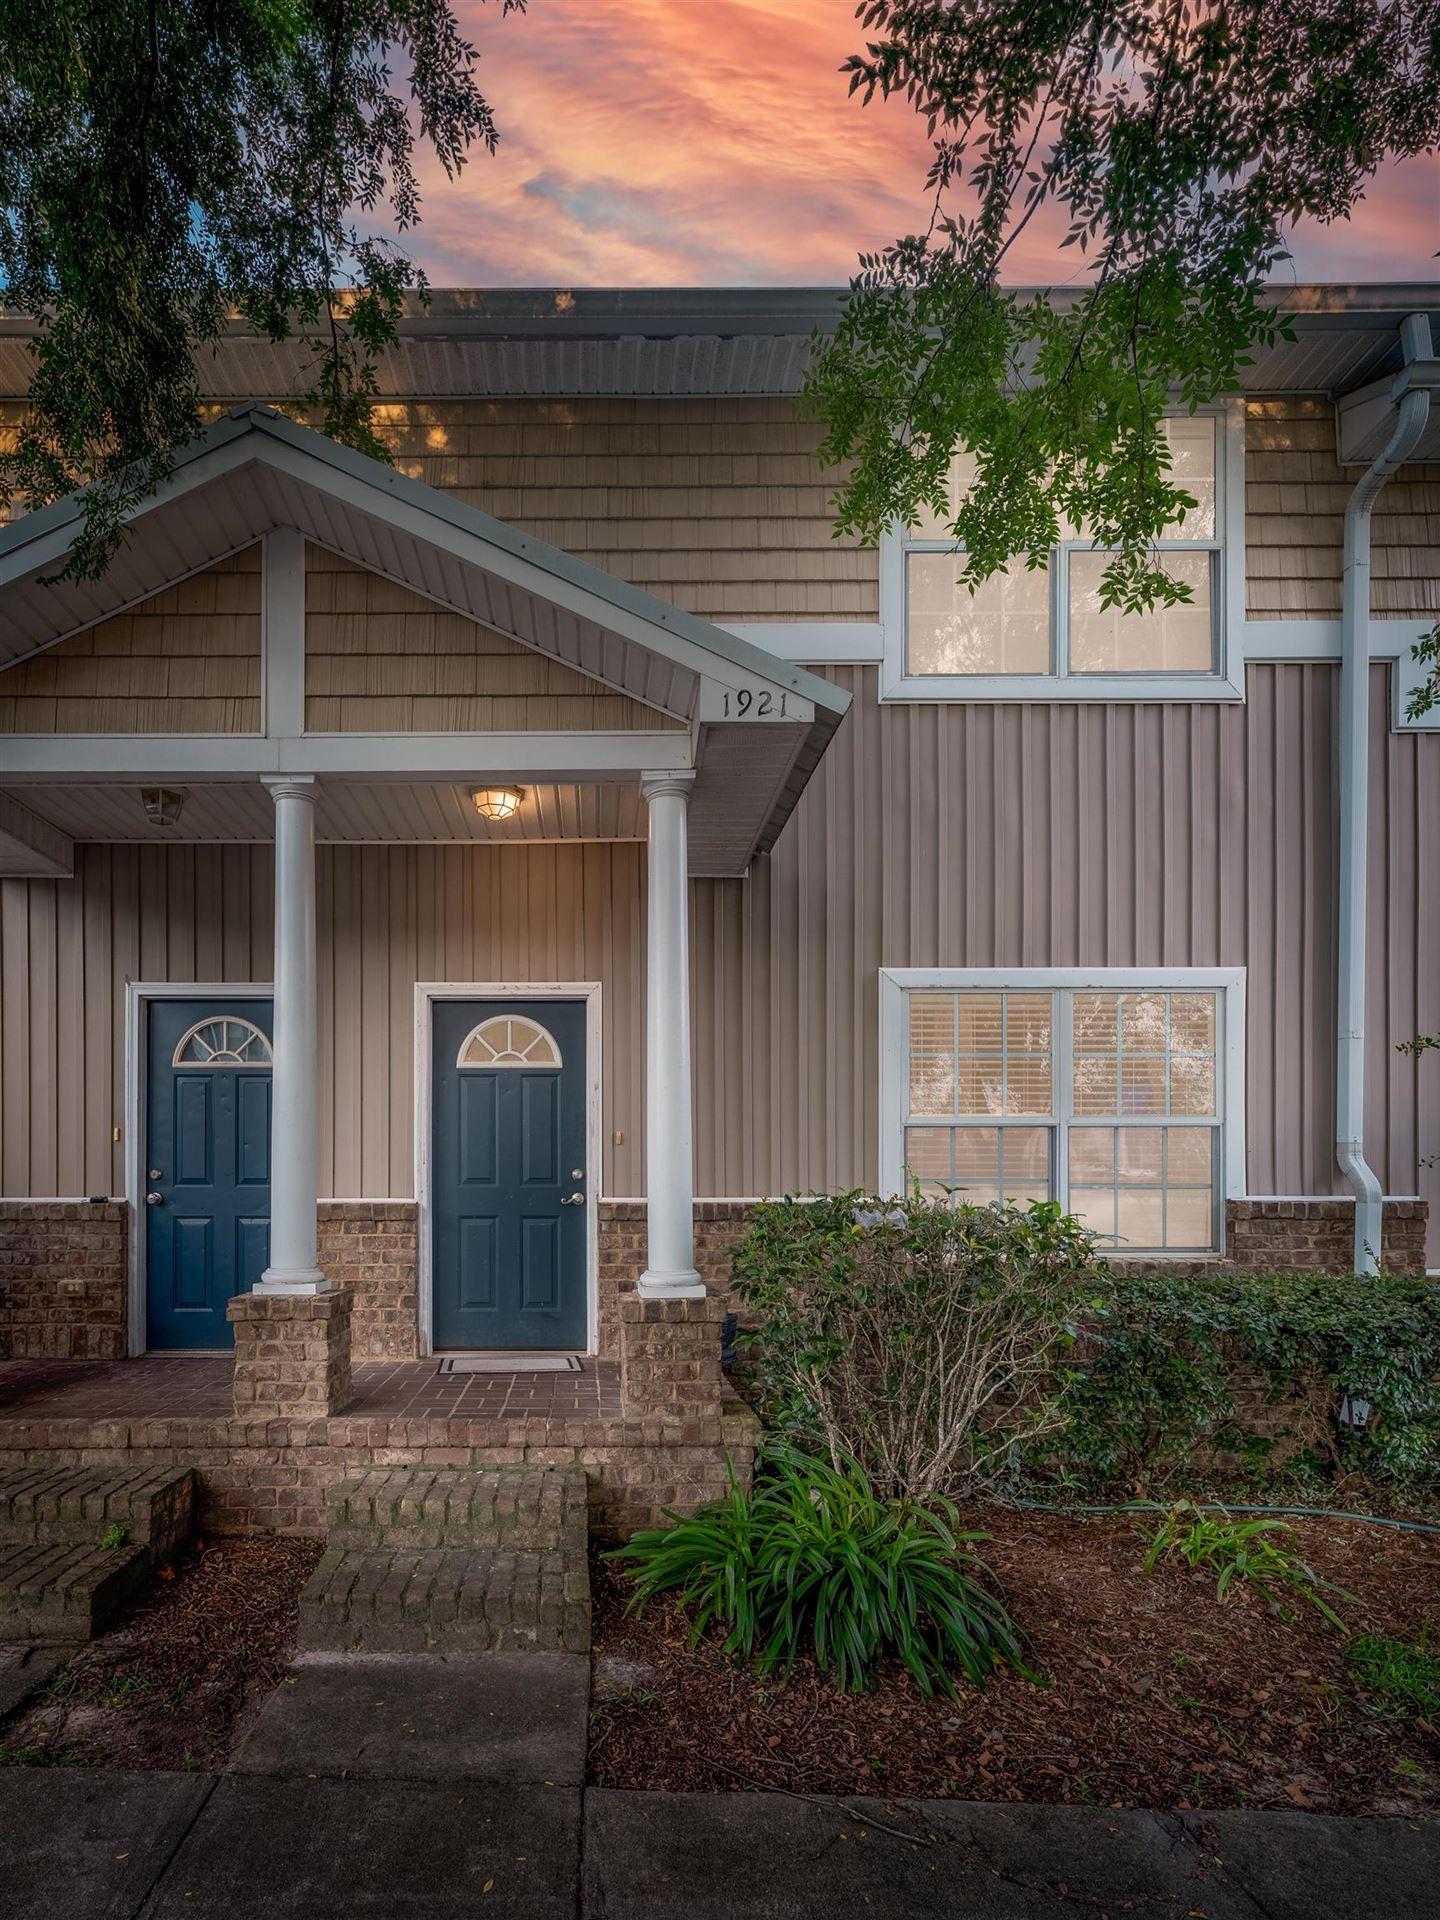 1921 Bloomington Avenue #3402, Tallahassee, FL 32304 - MLS#: 336449